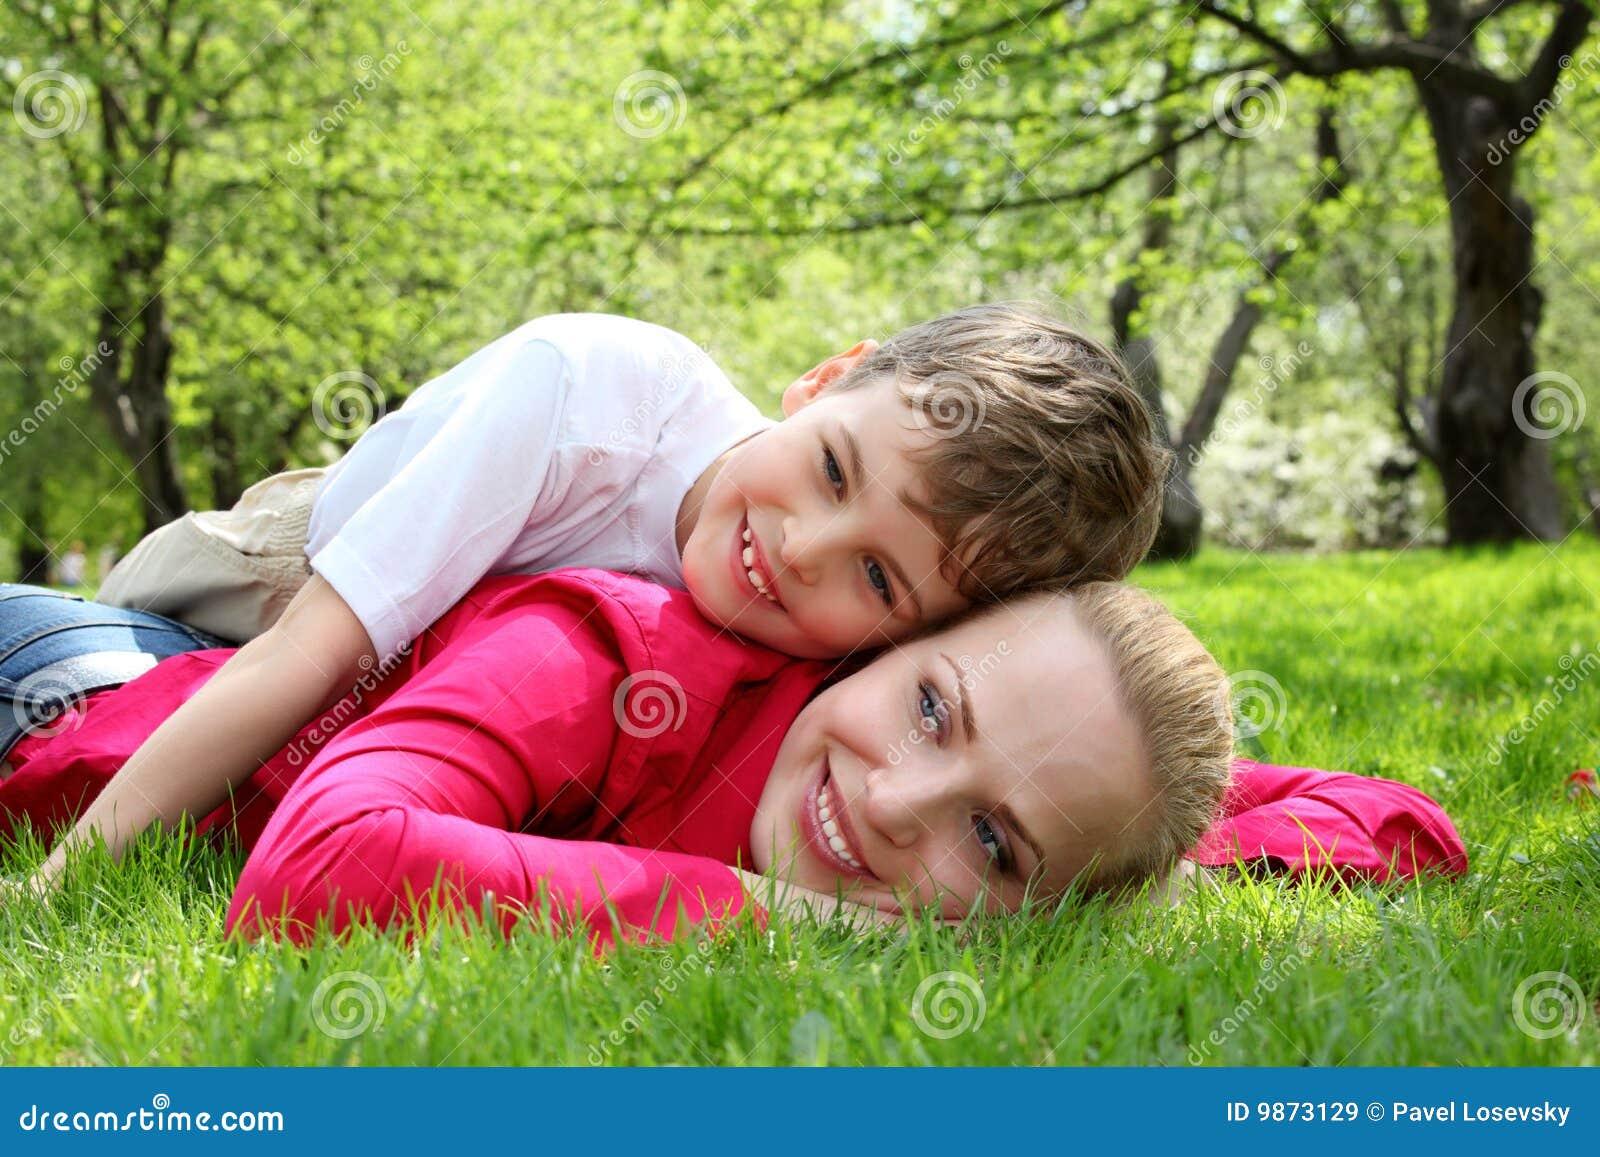 Мама и сын анал - 432 видео. - порно видео на